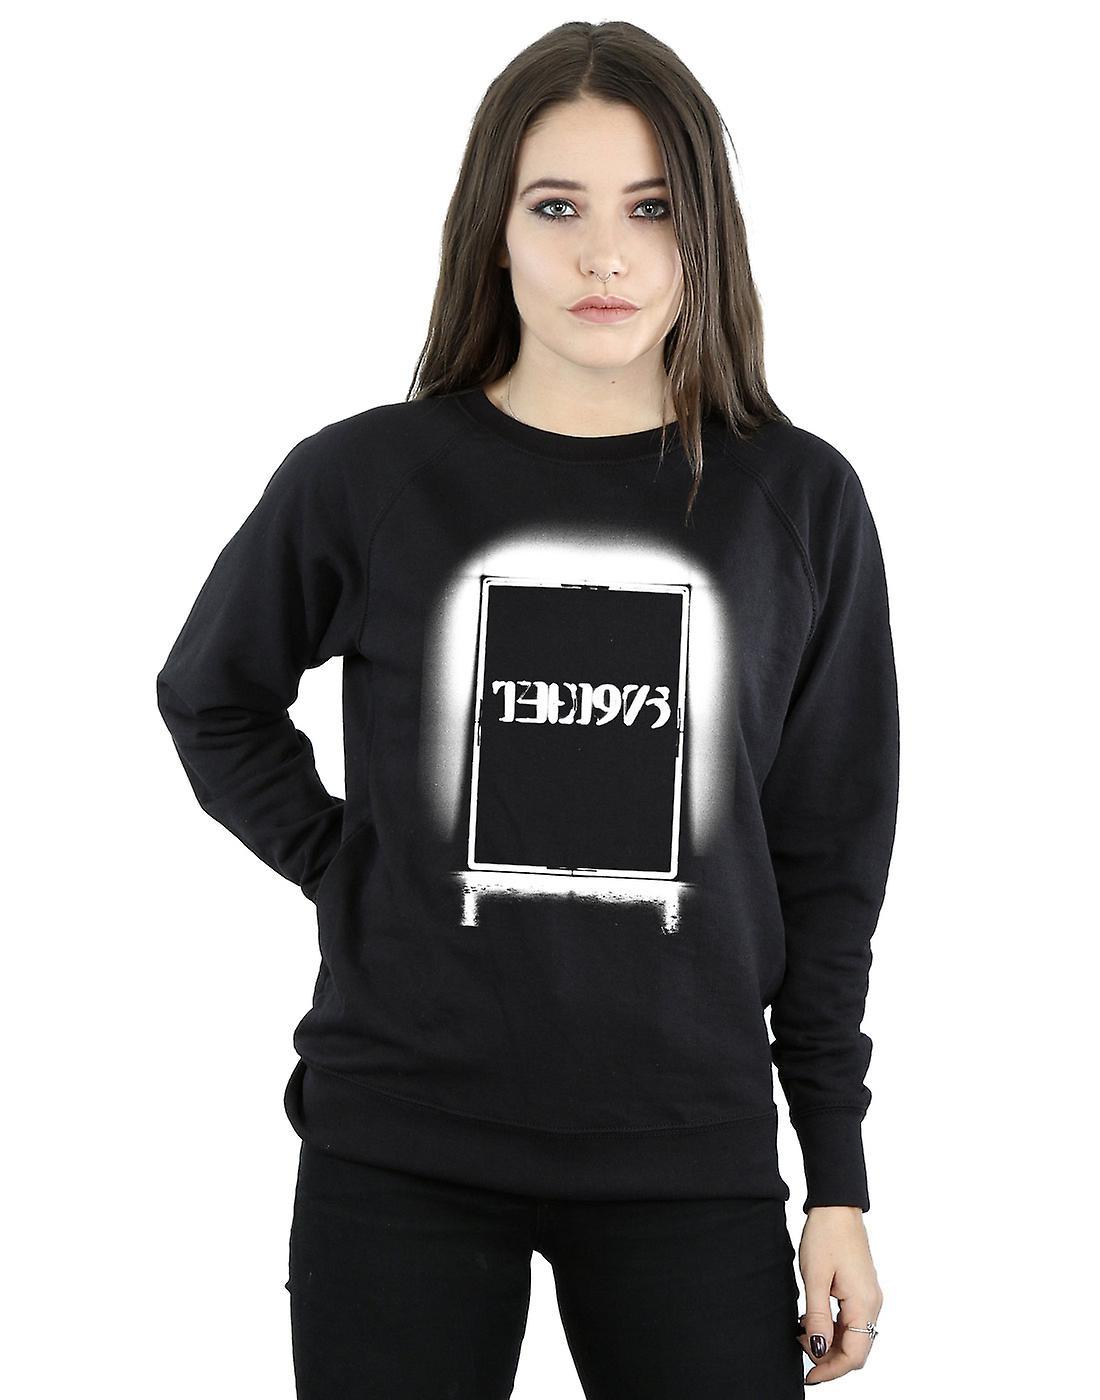 The 1975 Women's Black Tour Sweatshirt